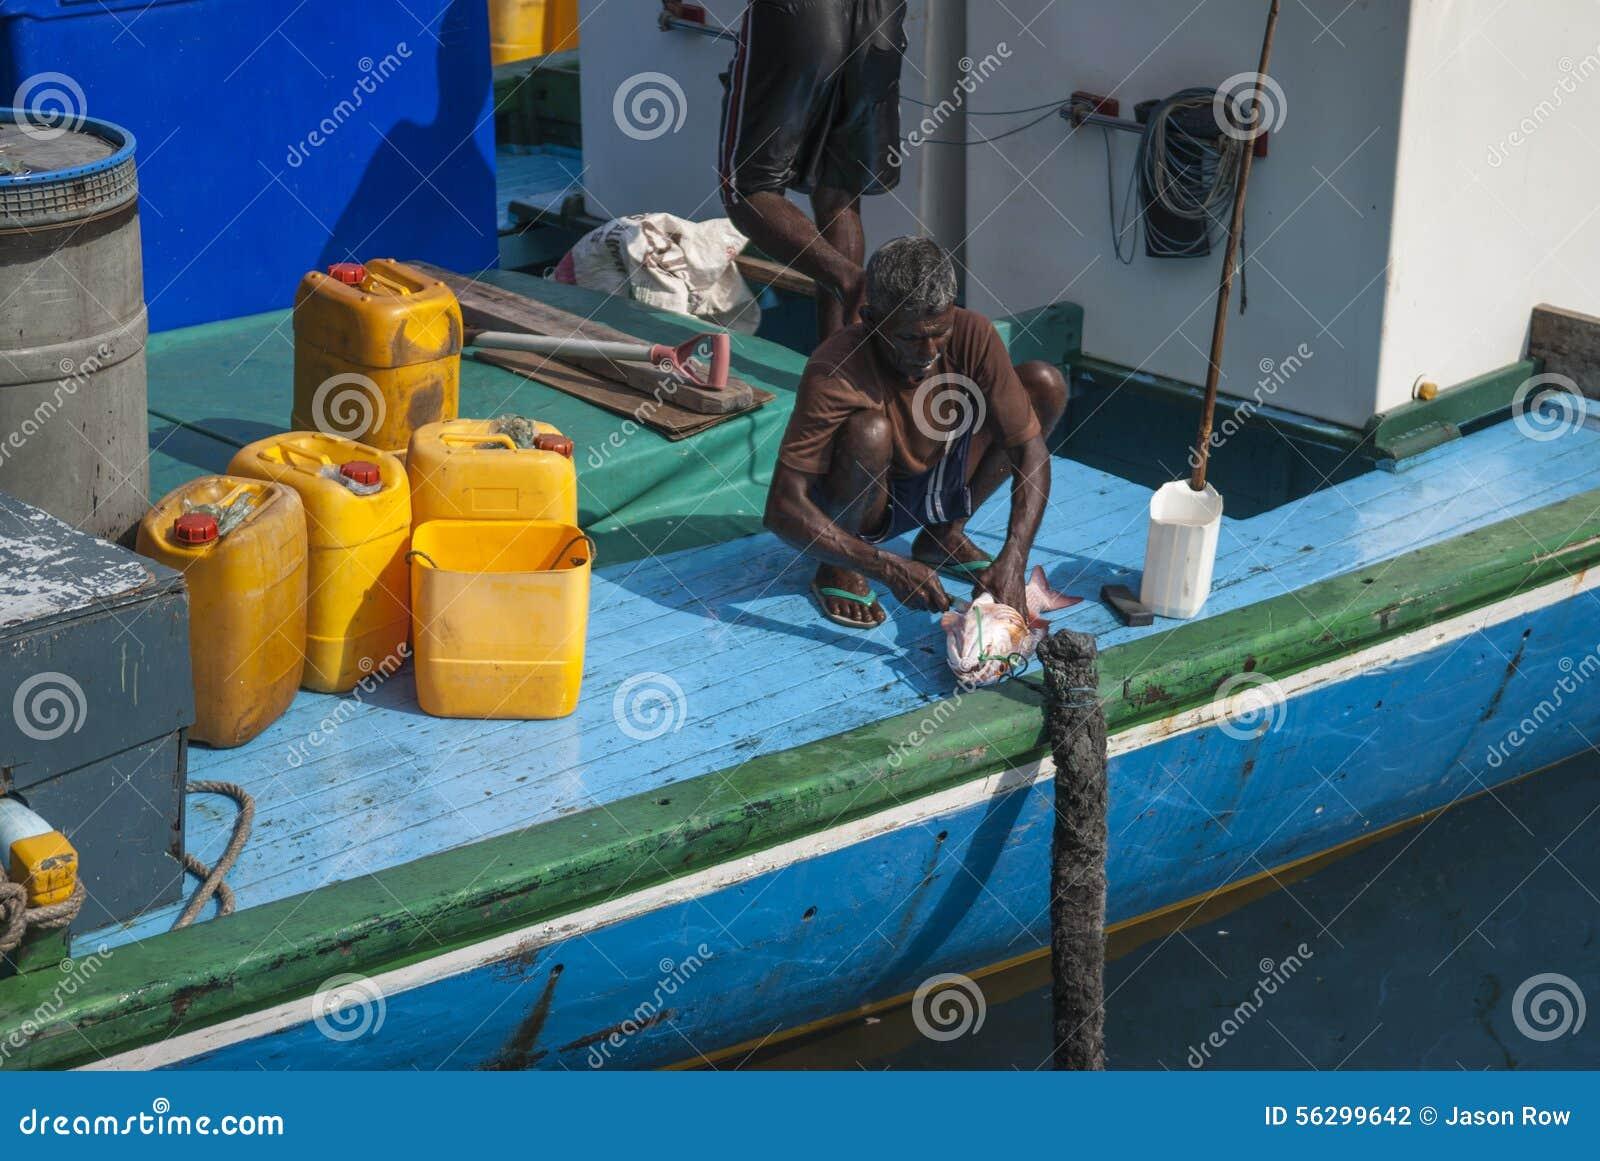 MALE/MALDIVES - 30TH MARZEC 2007 - rybacy w schronieniu Ma